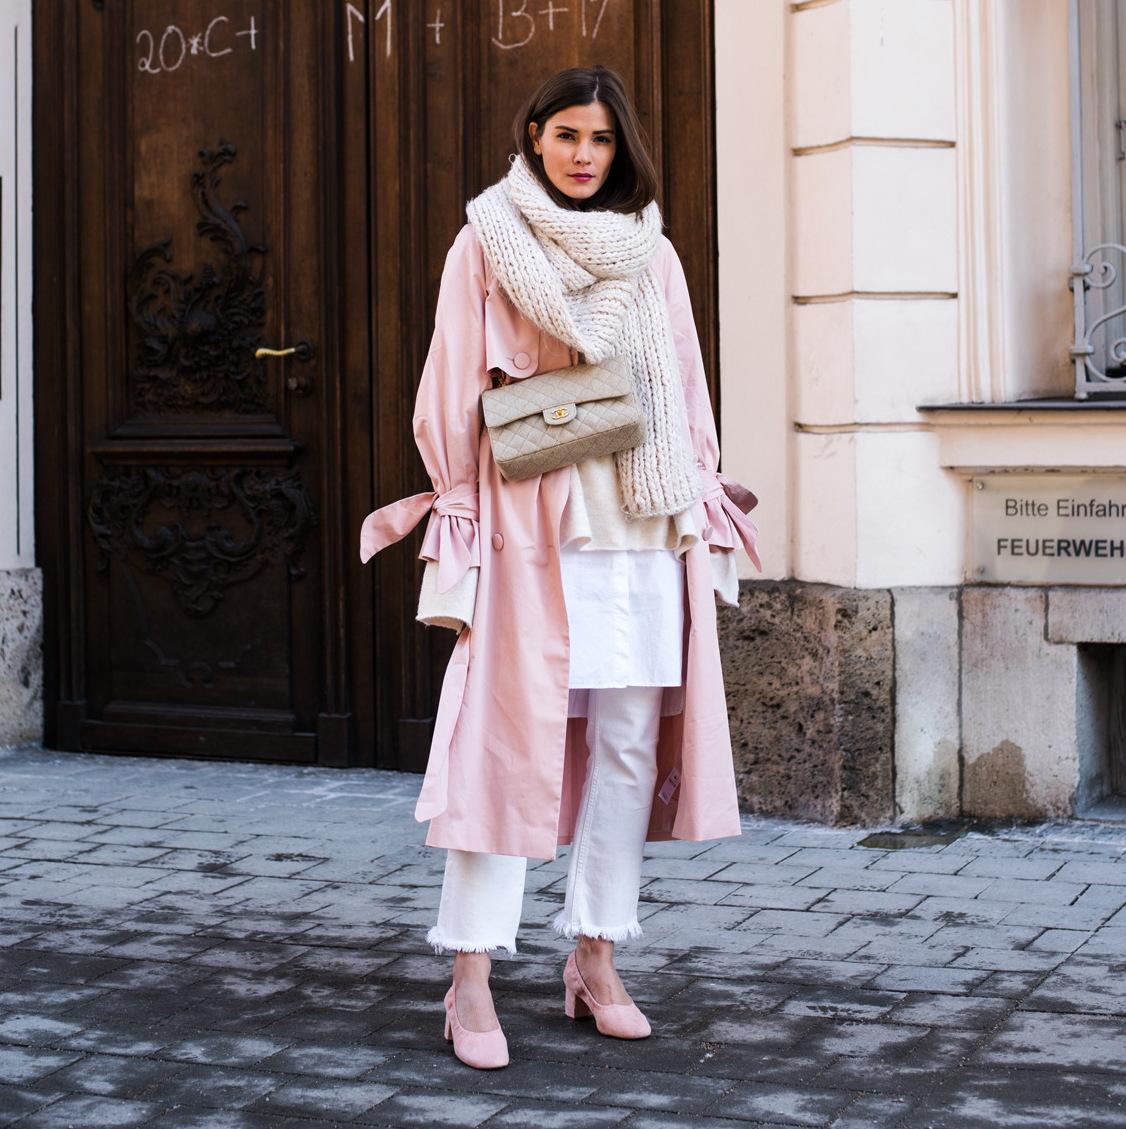 nina-schwichtenberg-german-fashion-and-lifestyle-blog-fashiioncarpet